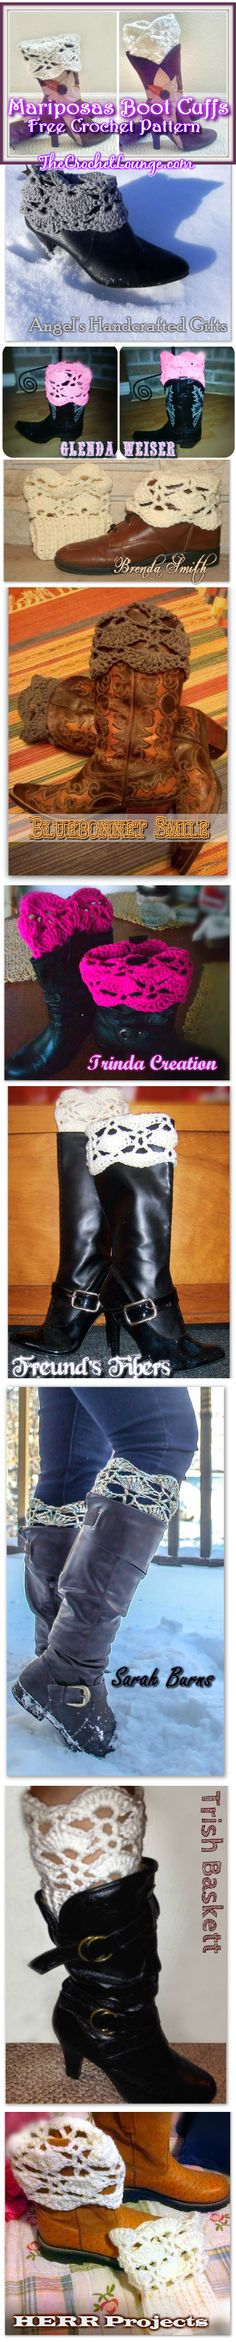 angel crochet cuffs, crochet mariposa, crochet stitch, free crochet shorts pattern, boot cuffs, crochet loung, crochet free patterns, angels, boots